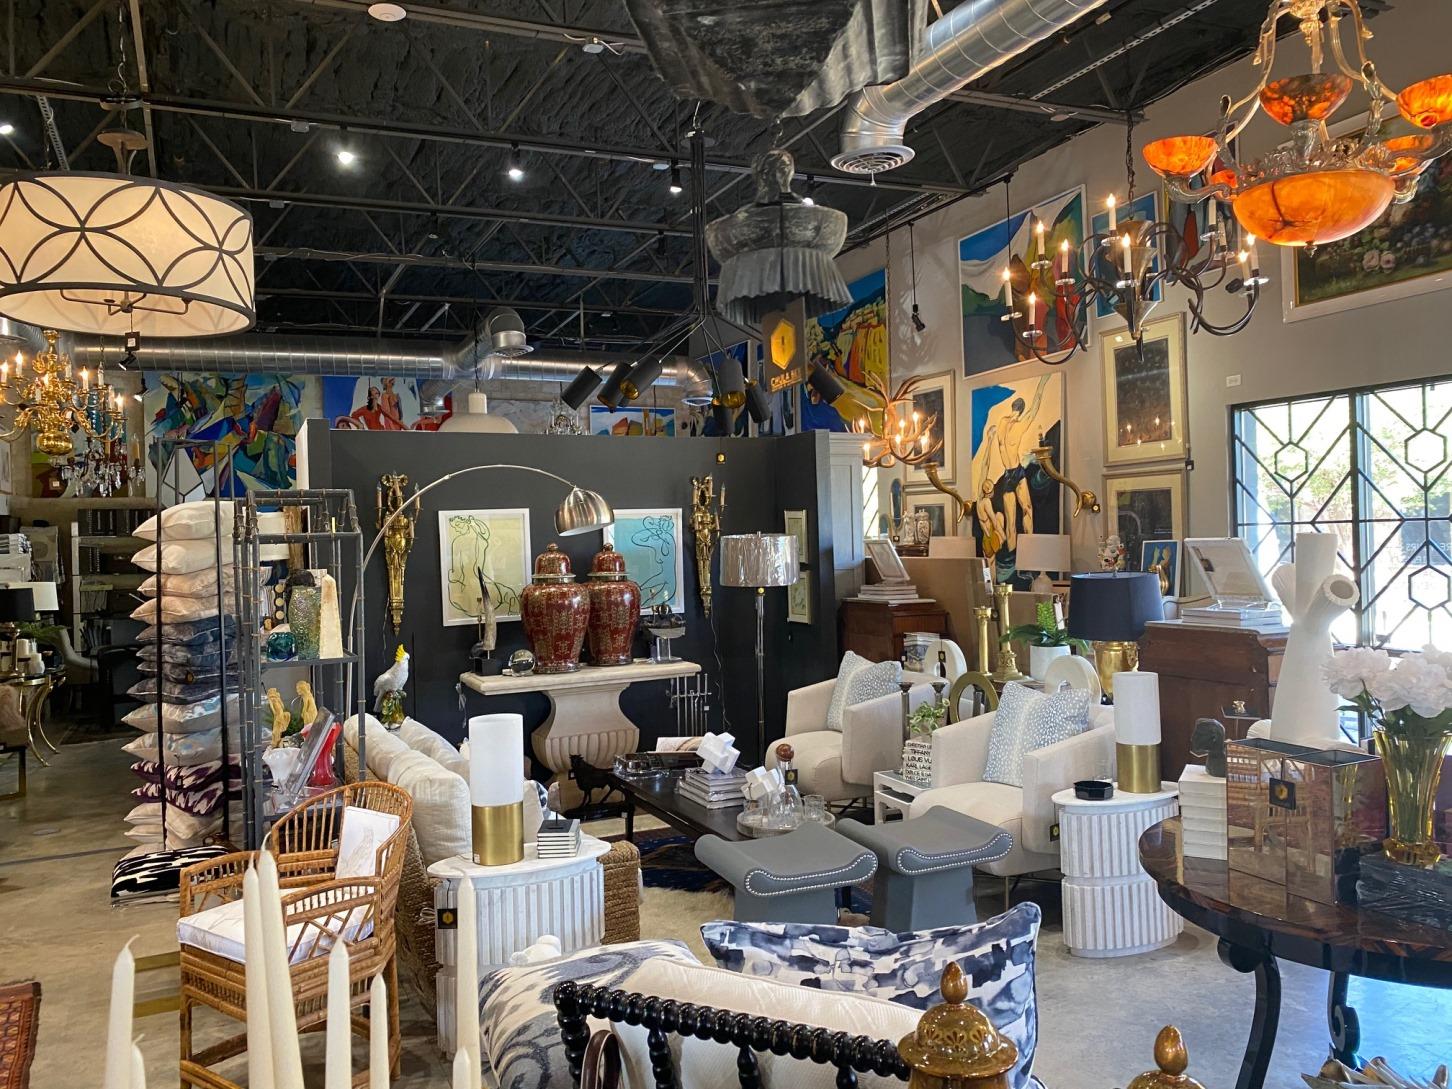 Chula Bee Design, a Full-Service Interior Design Firm You Can Trust